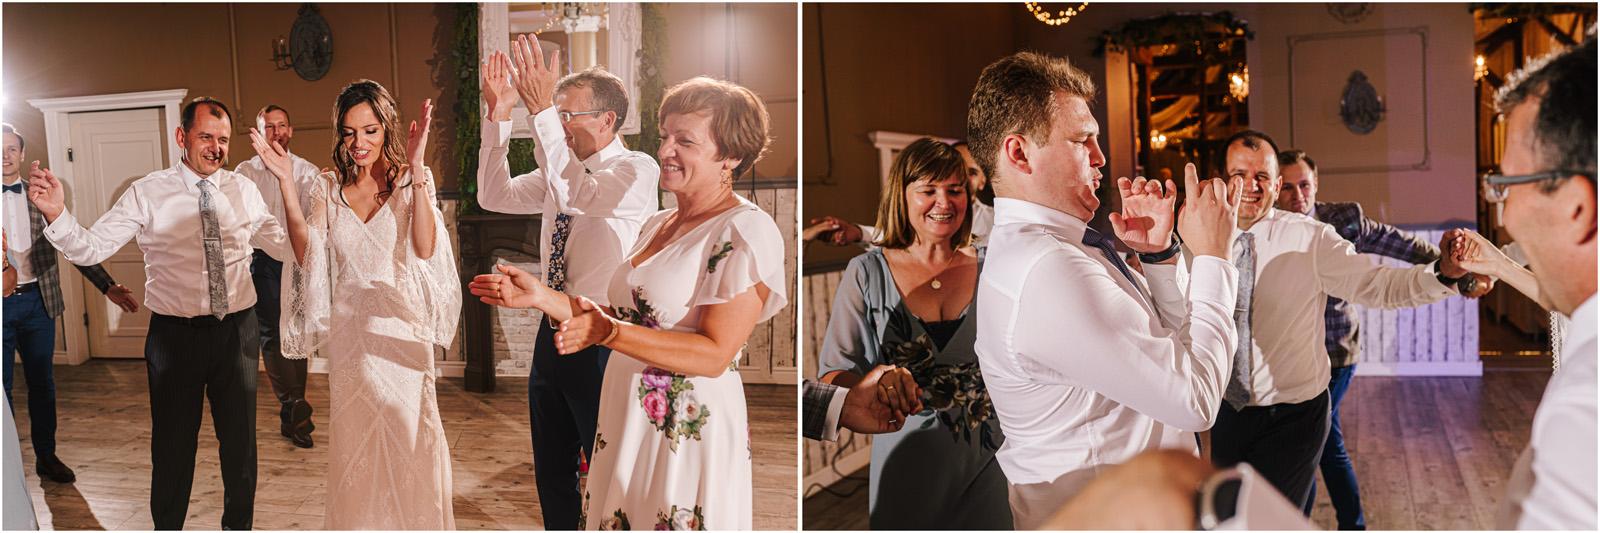 Ania & Mateusz | boho wesele w Stodole pod Kasztanami 119